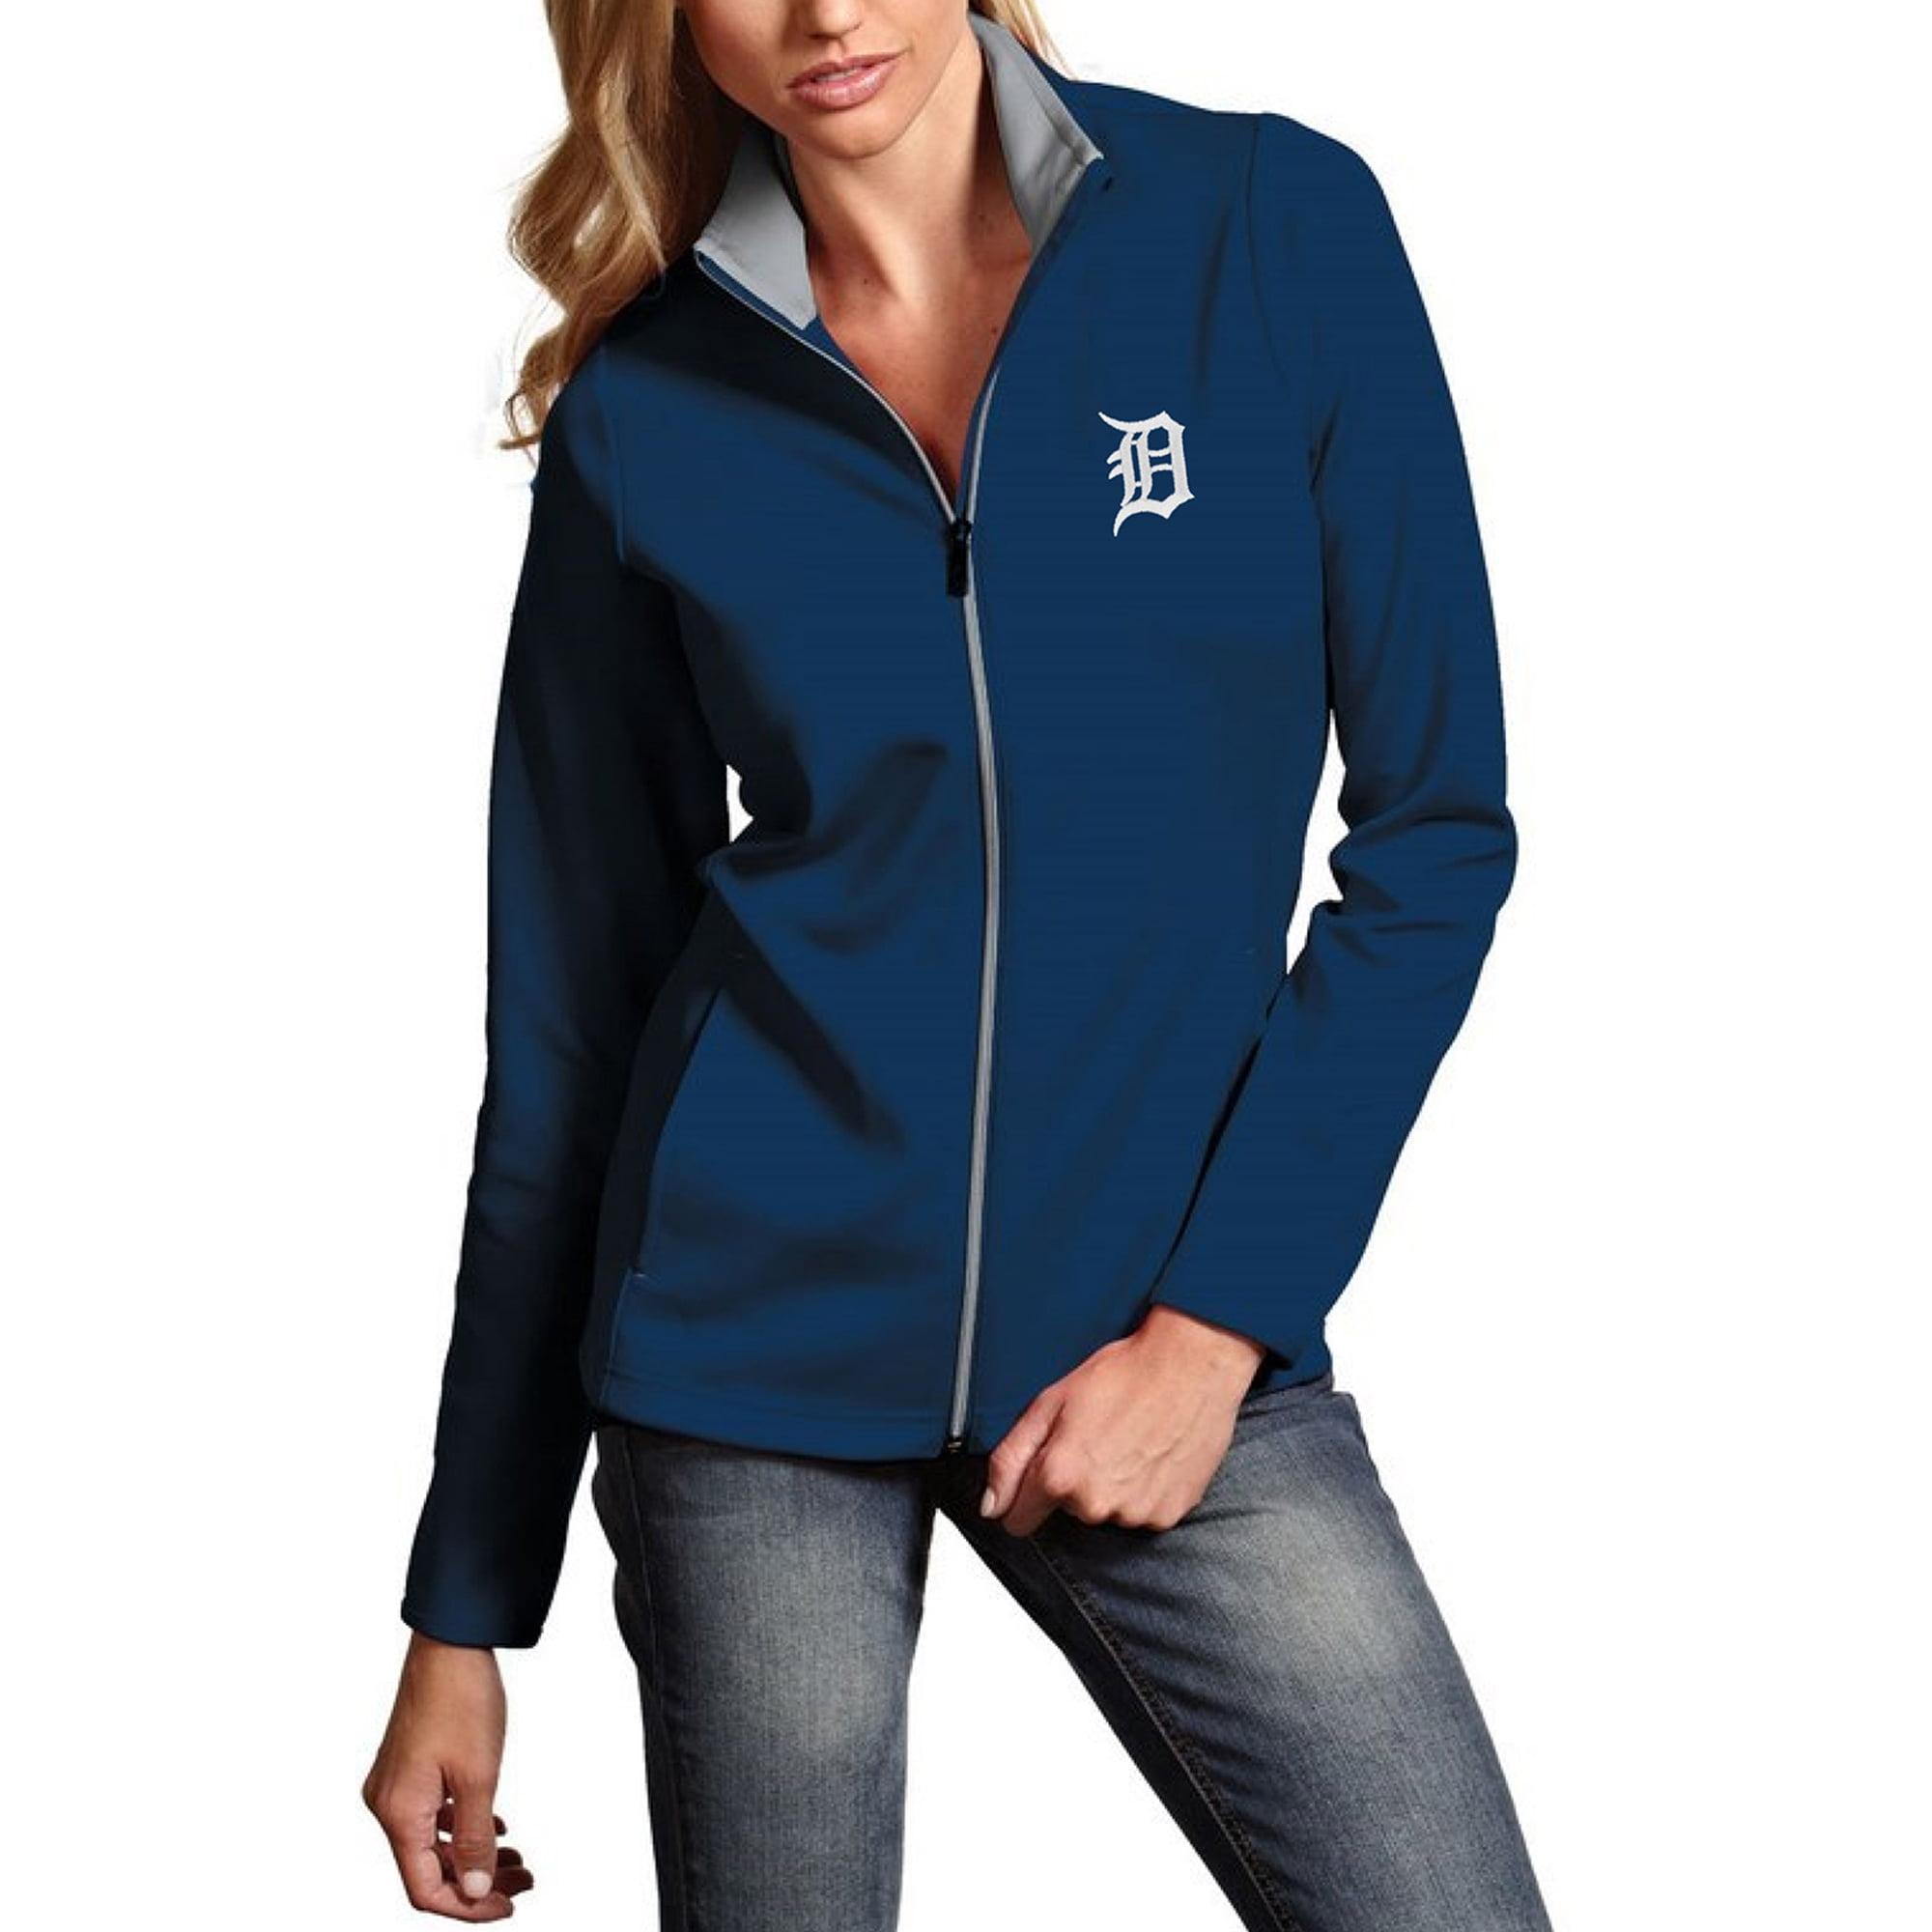 Detroit Tigers Antigua Women's Leader Full-Zip Jacket - Navy